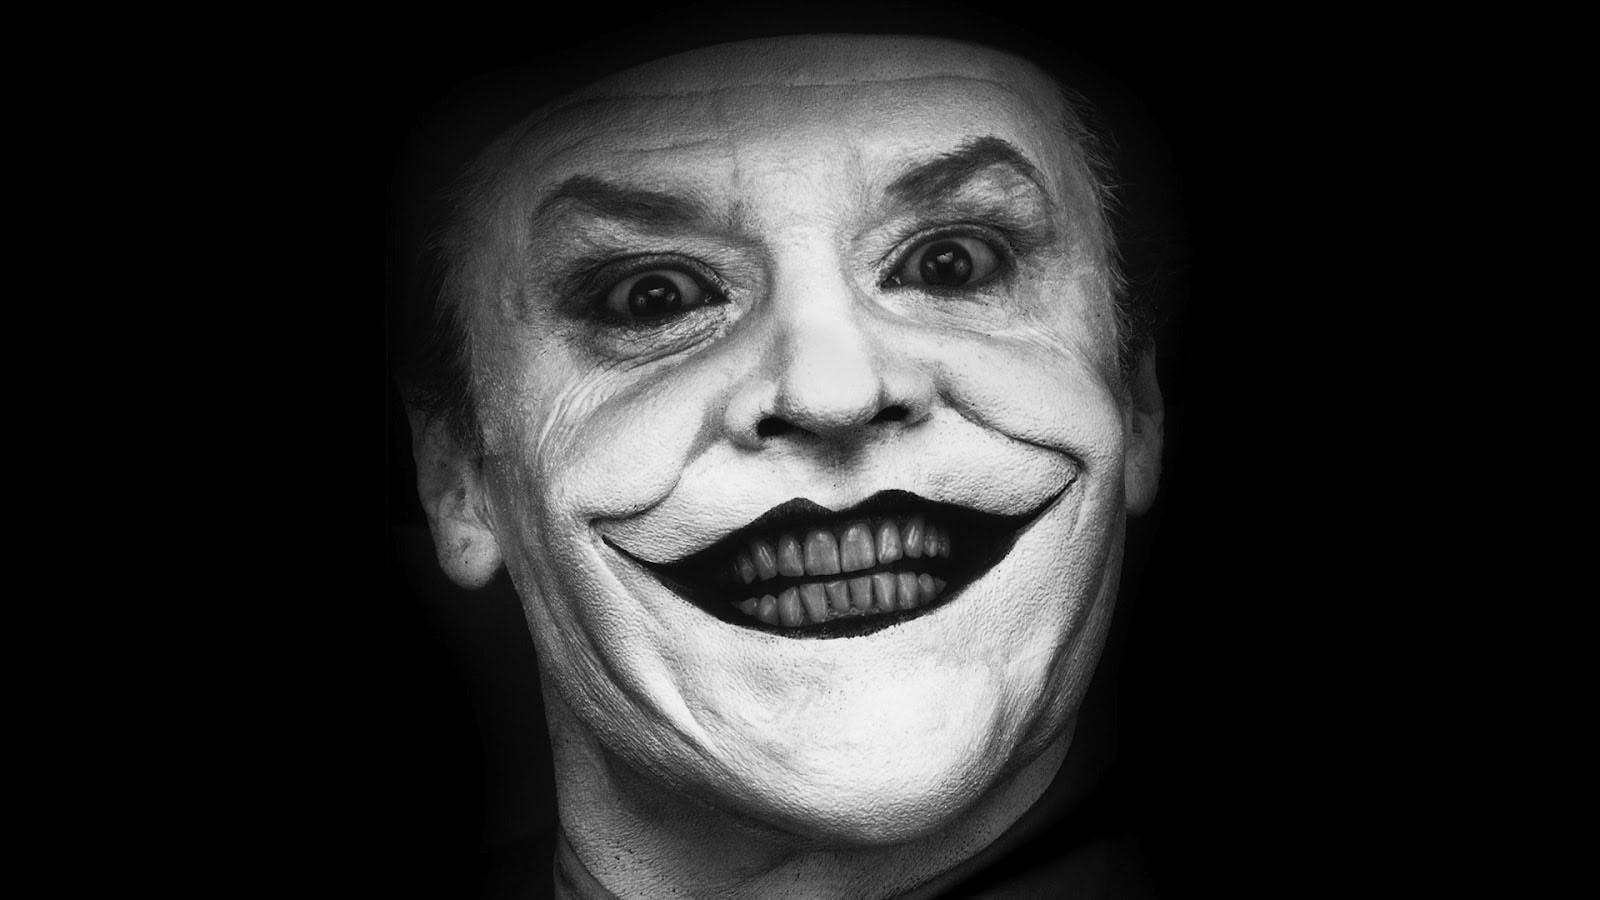 Jack Nicholson Joker Quotes Batman QuotesGram 1600x900